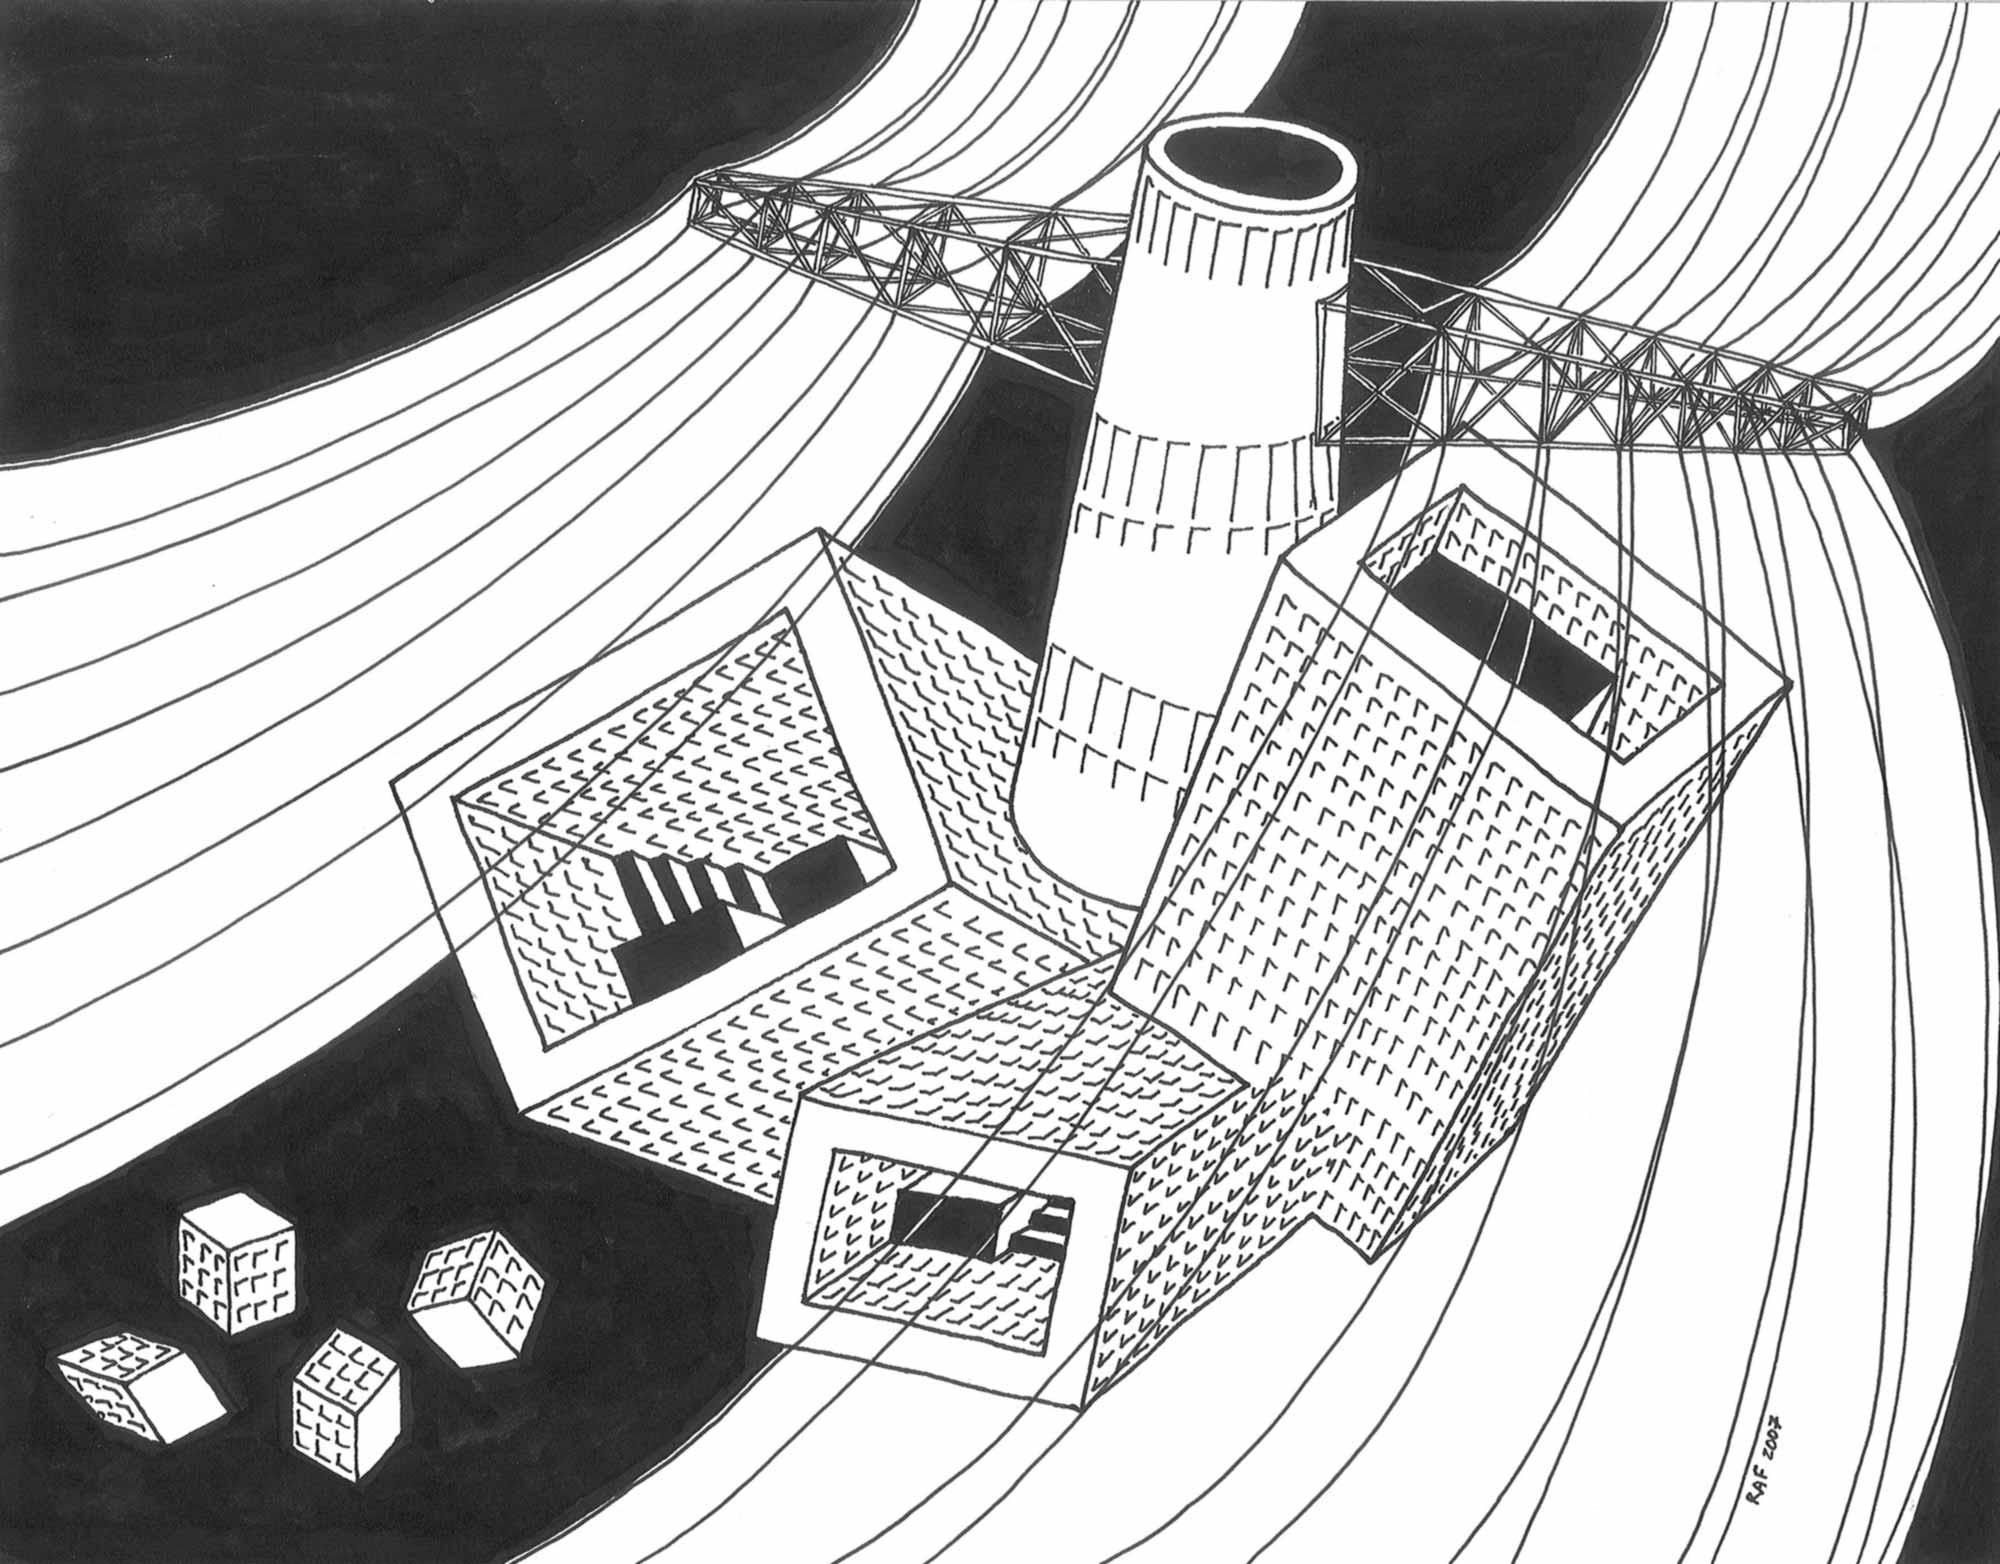 Vol de nuit, dessin, Raf Listowski, 2007